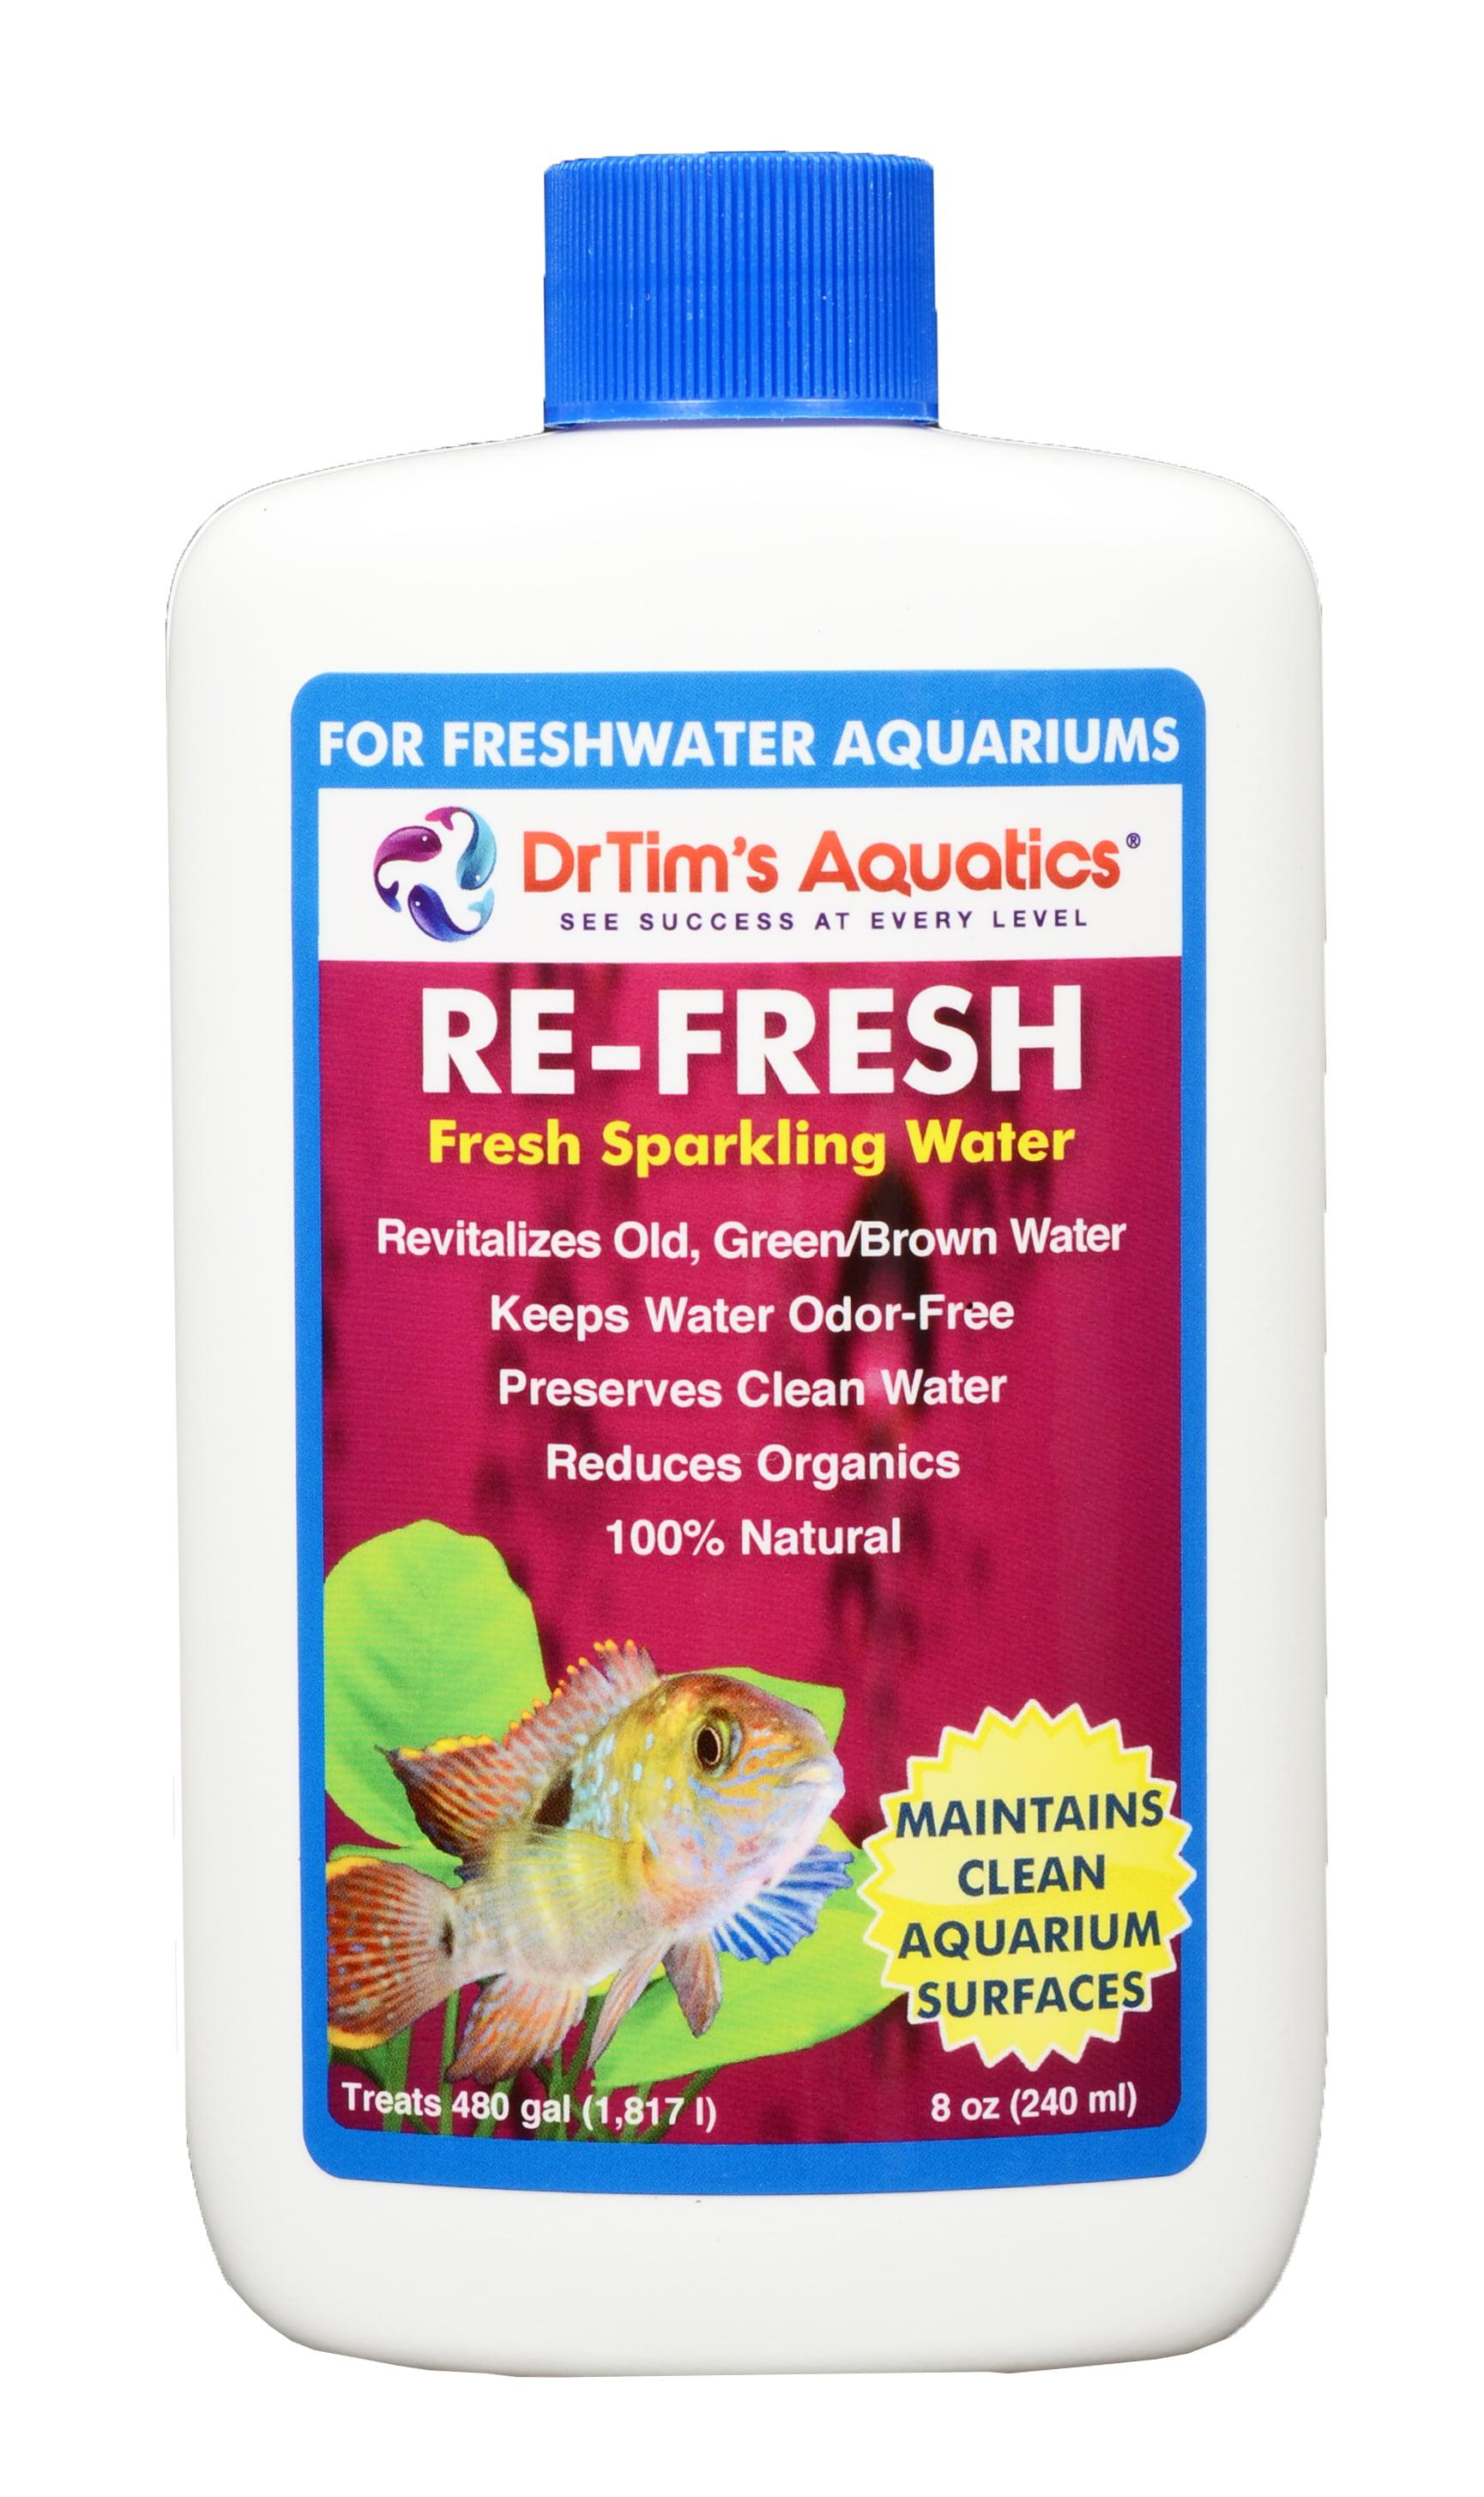 Aquarium Water Treatments and Test Kits - Walmart.com